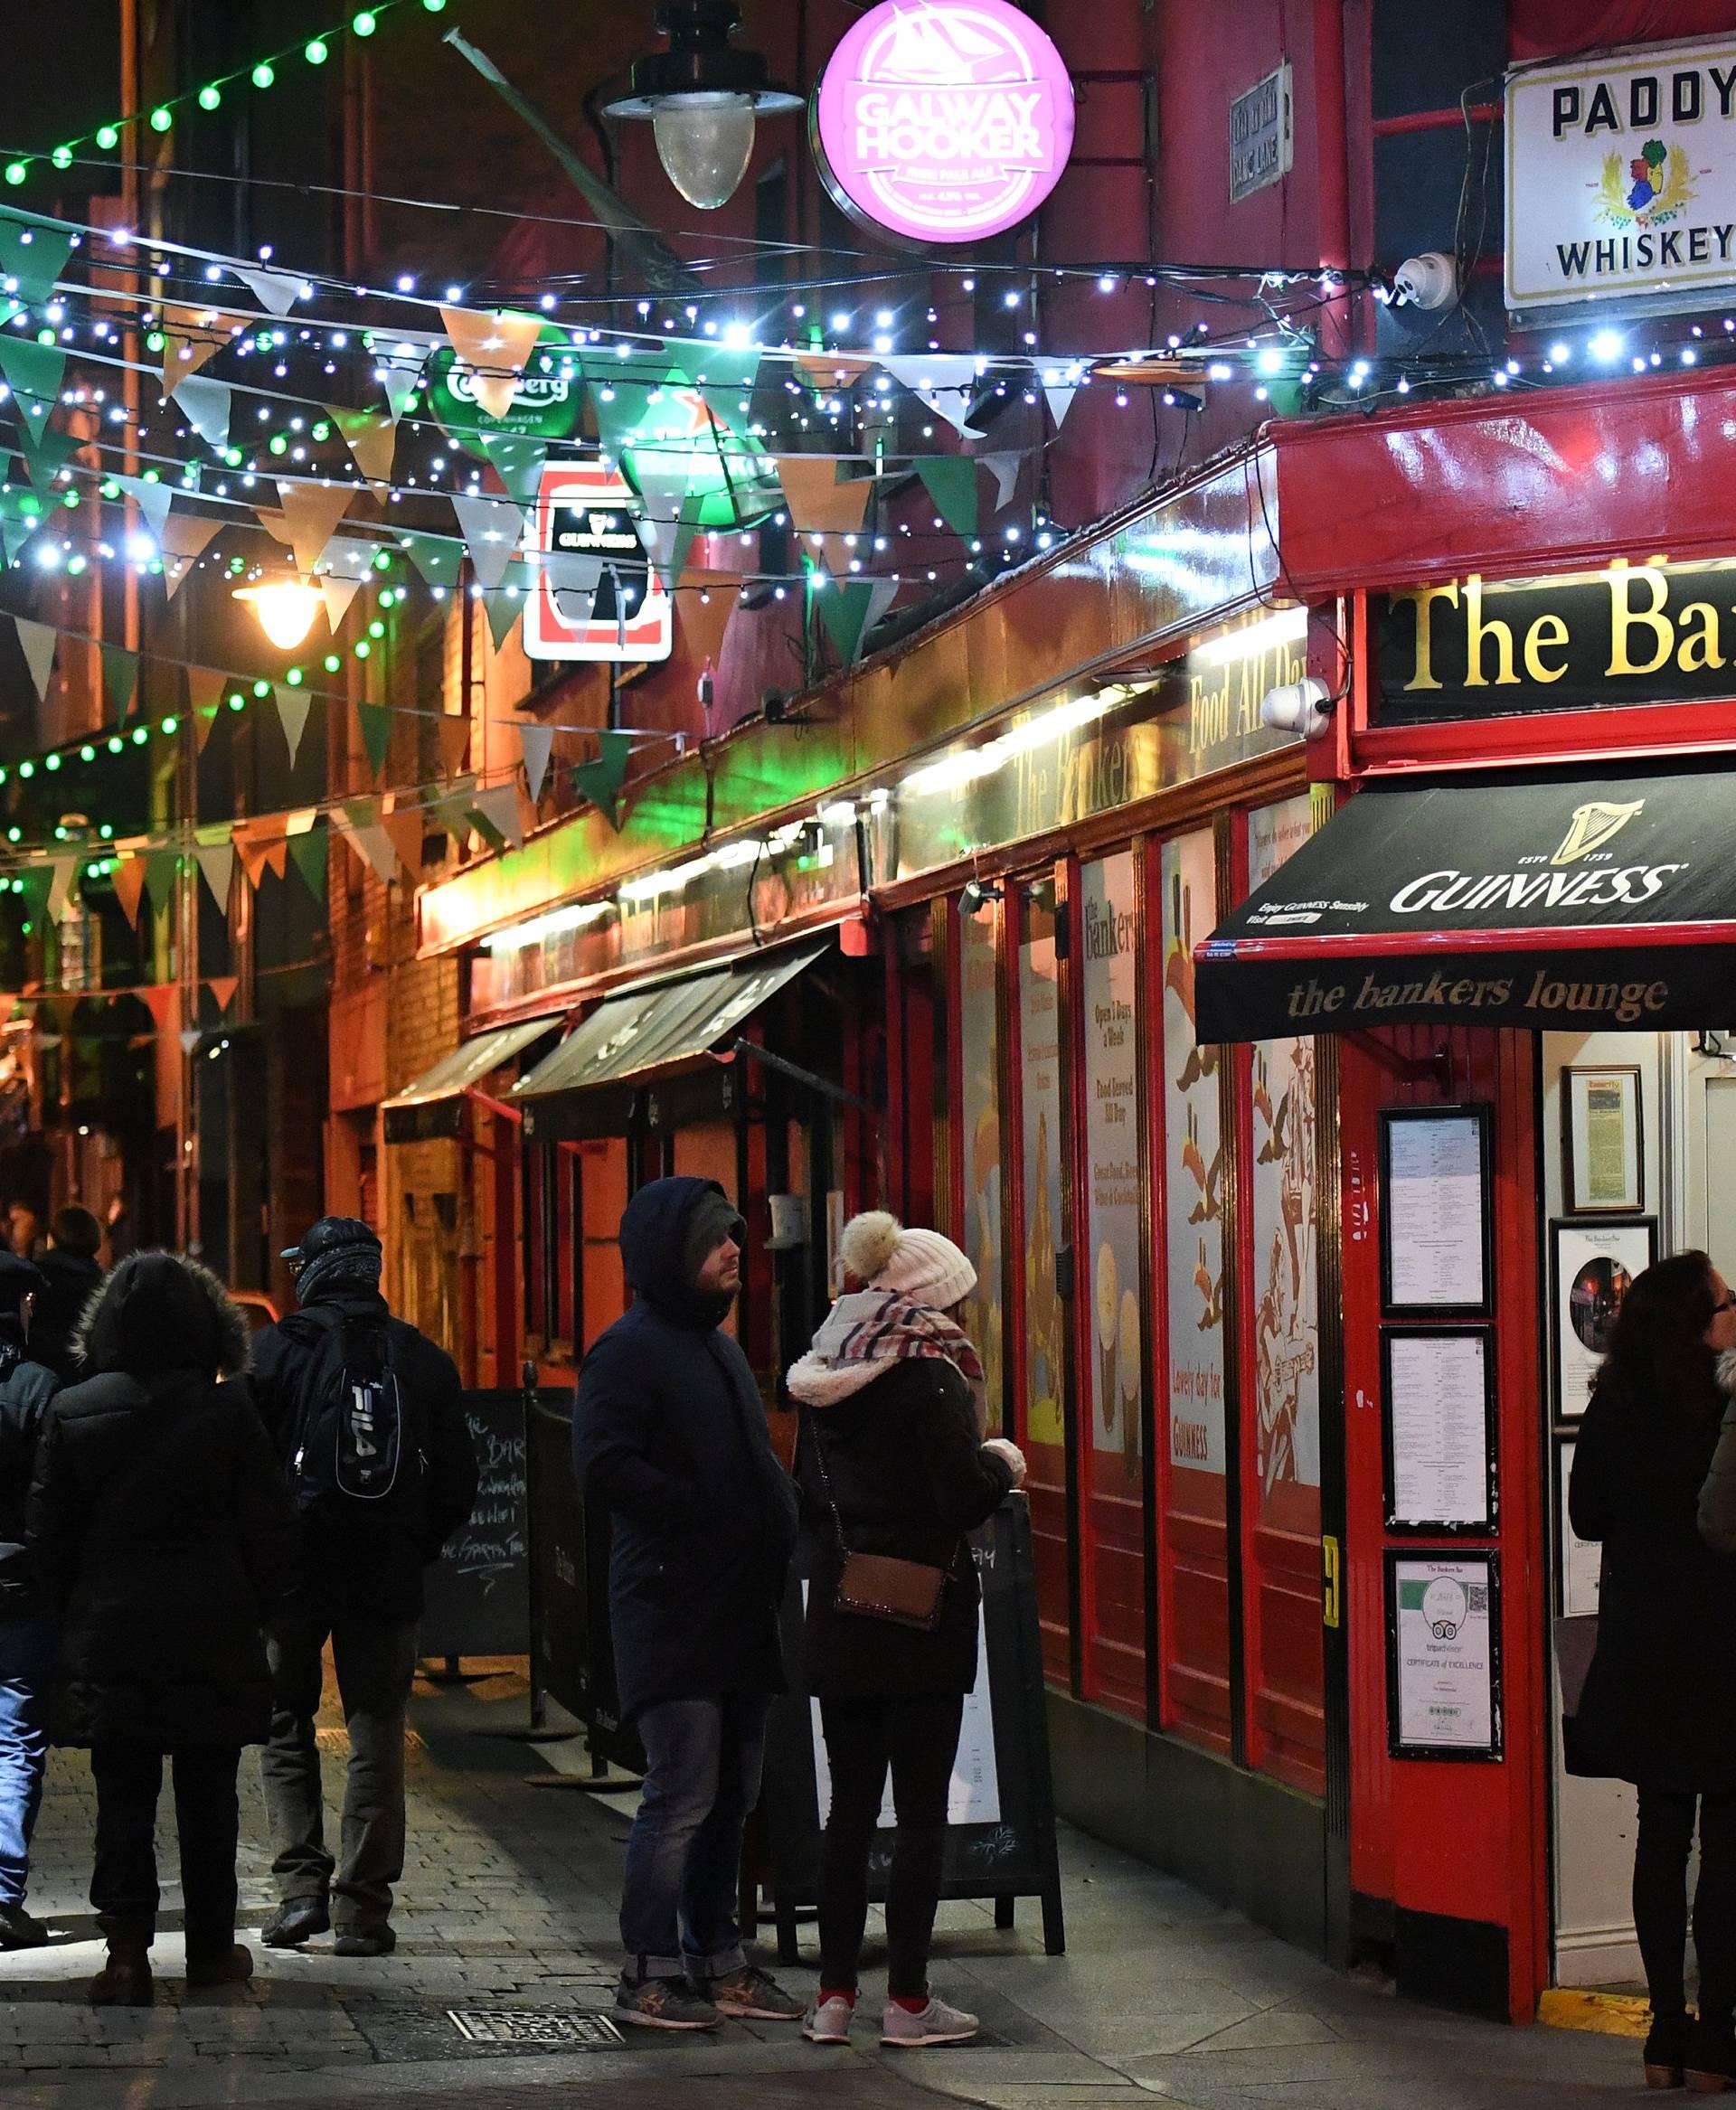 People walk under Christmas lights illuminating a street in Dublin